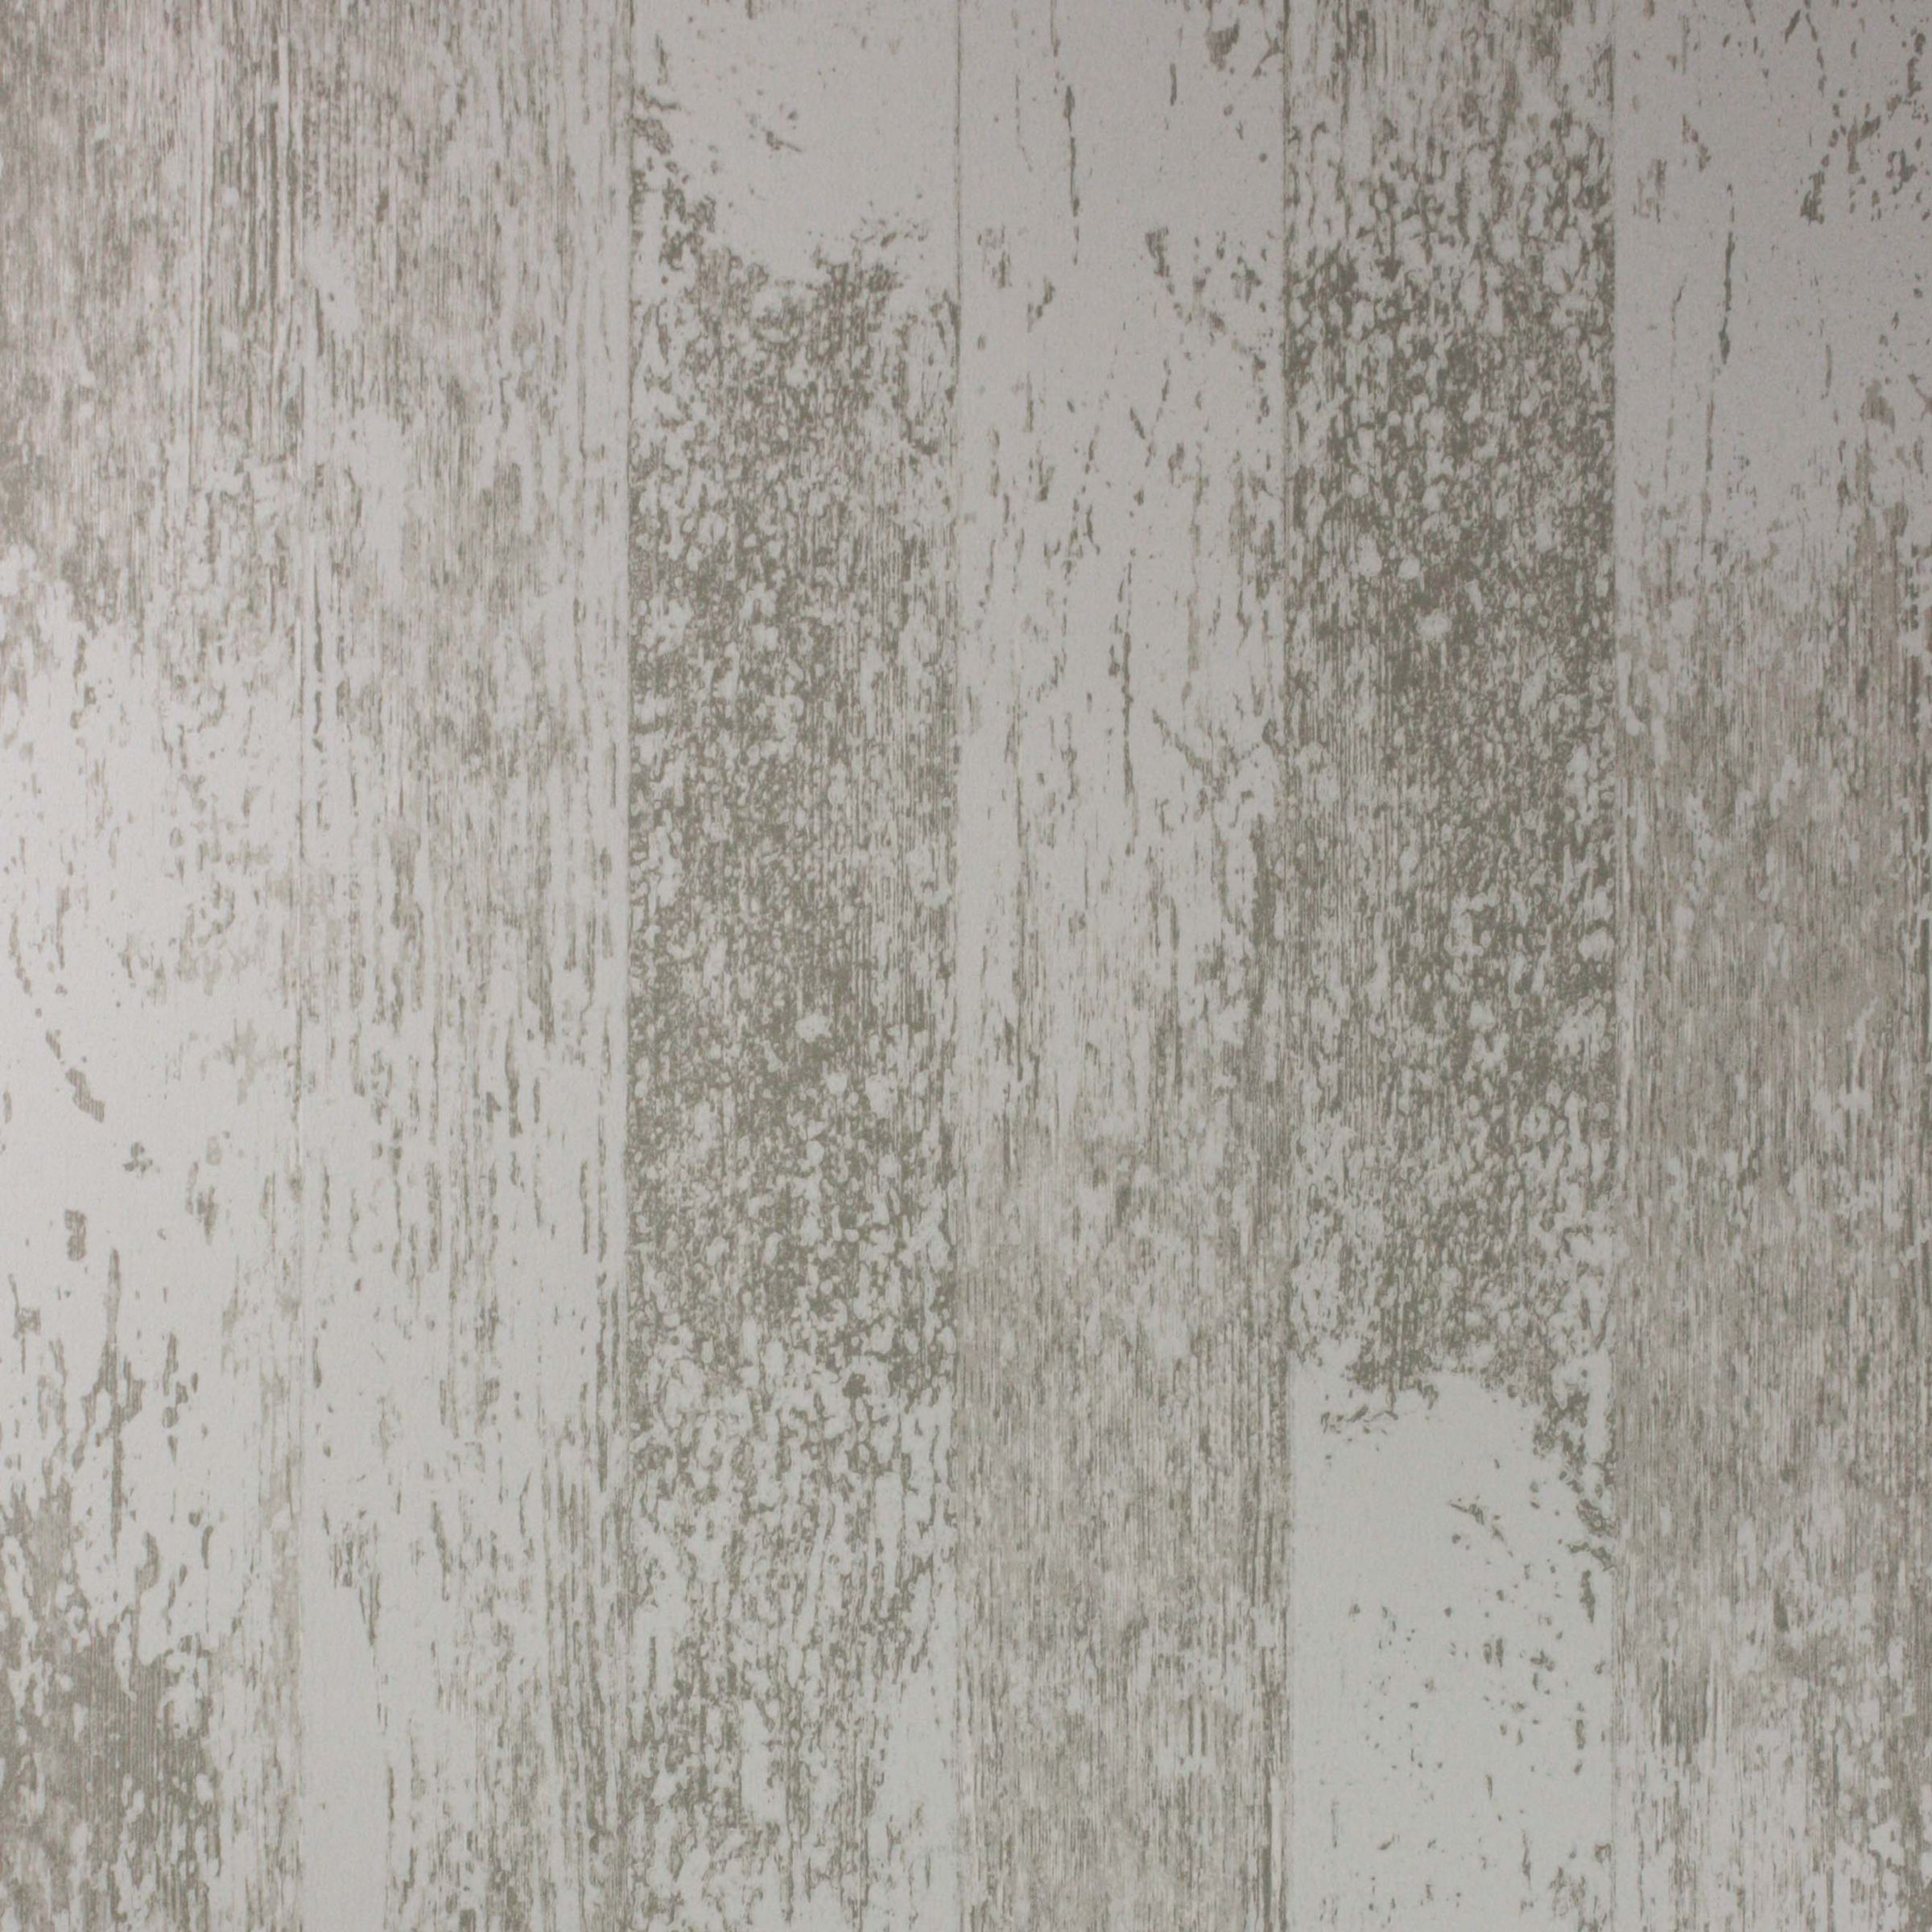 Osborne & Little Osborne & Little Driftwood Wallpaper